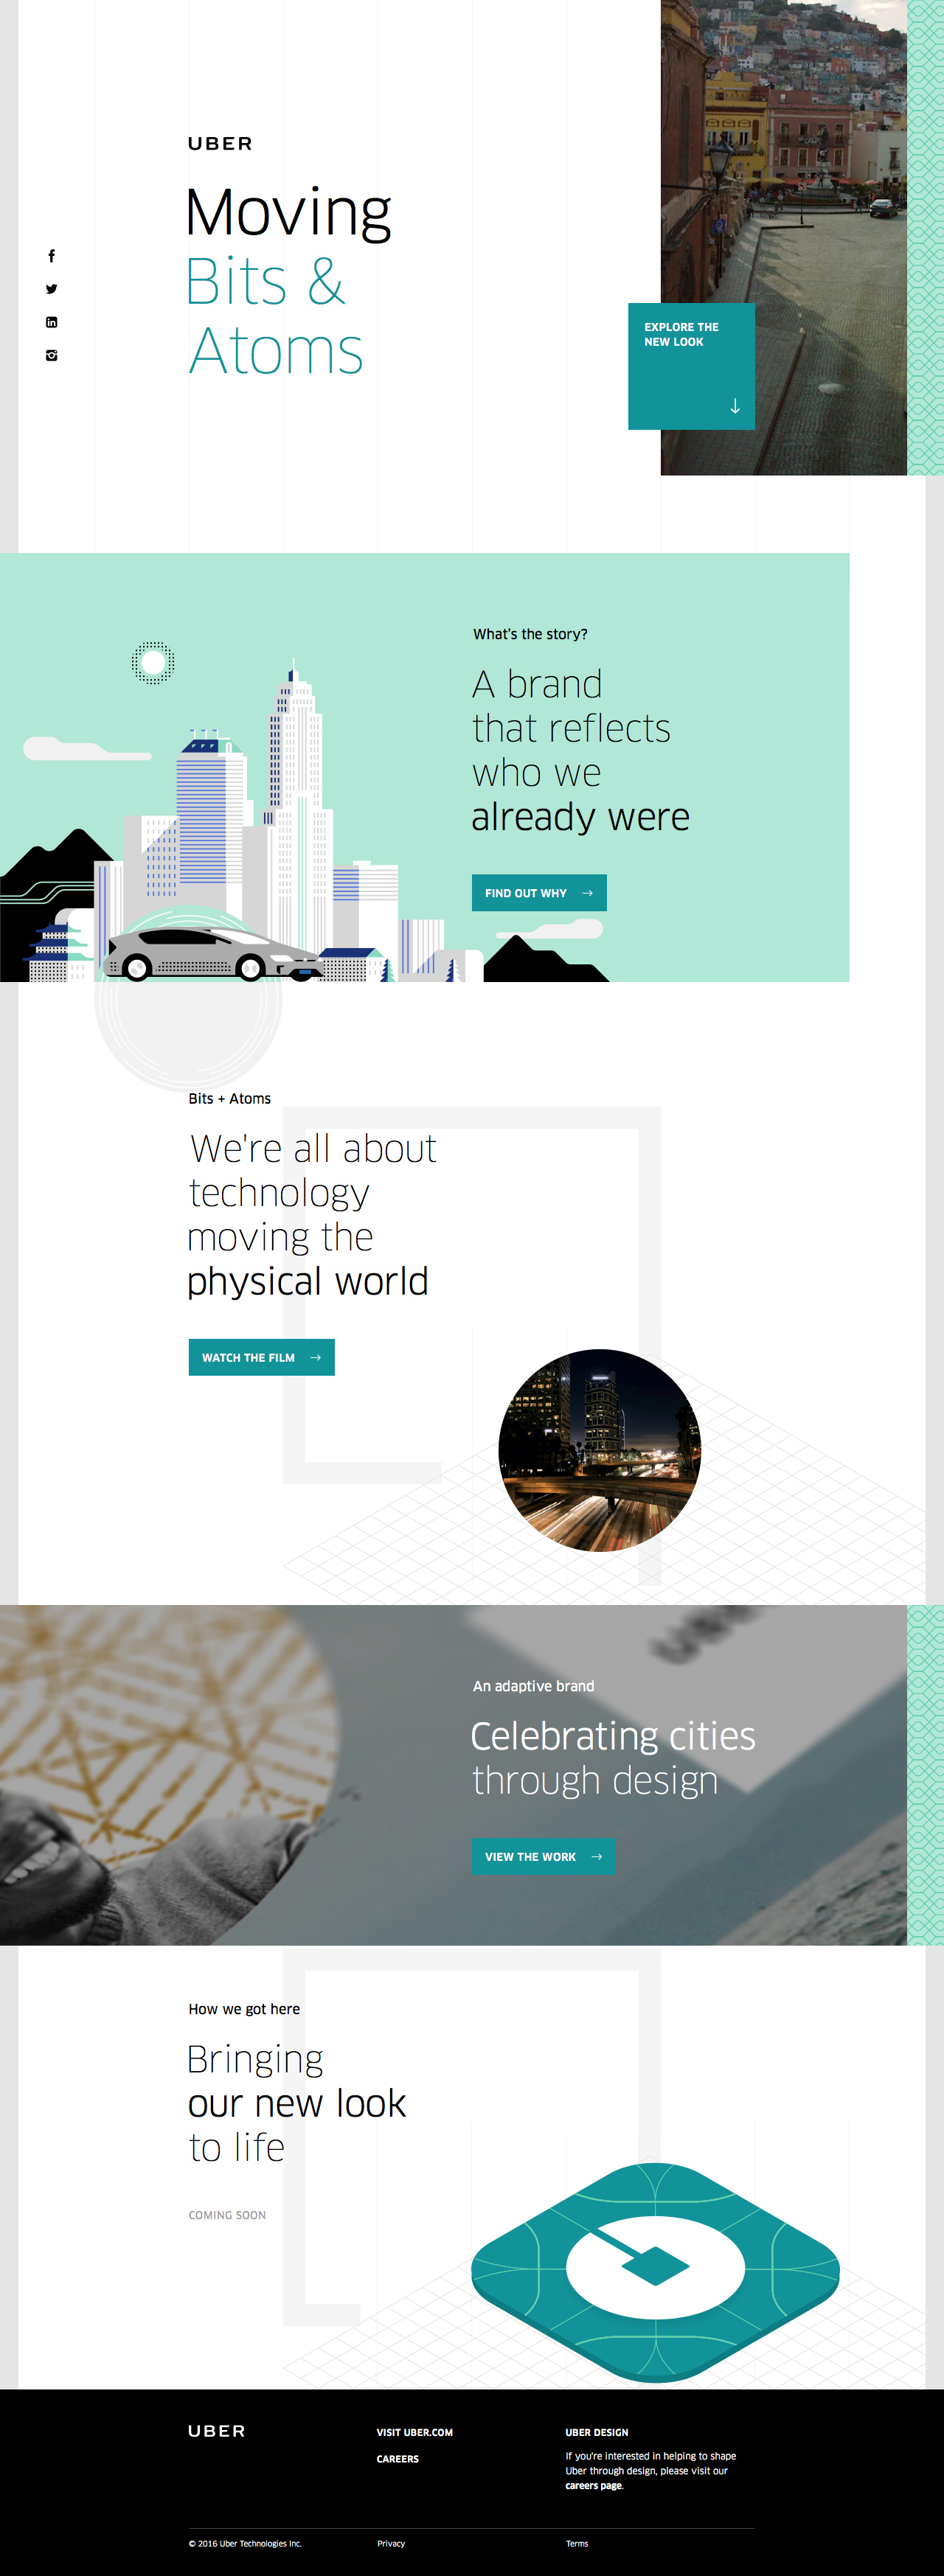 Uber Brand Experience Website Screenshot